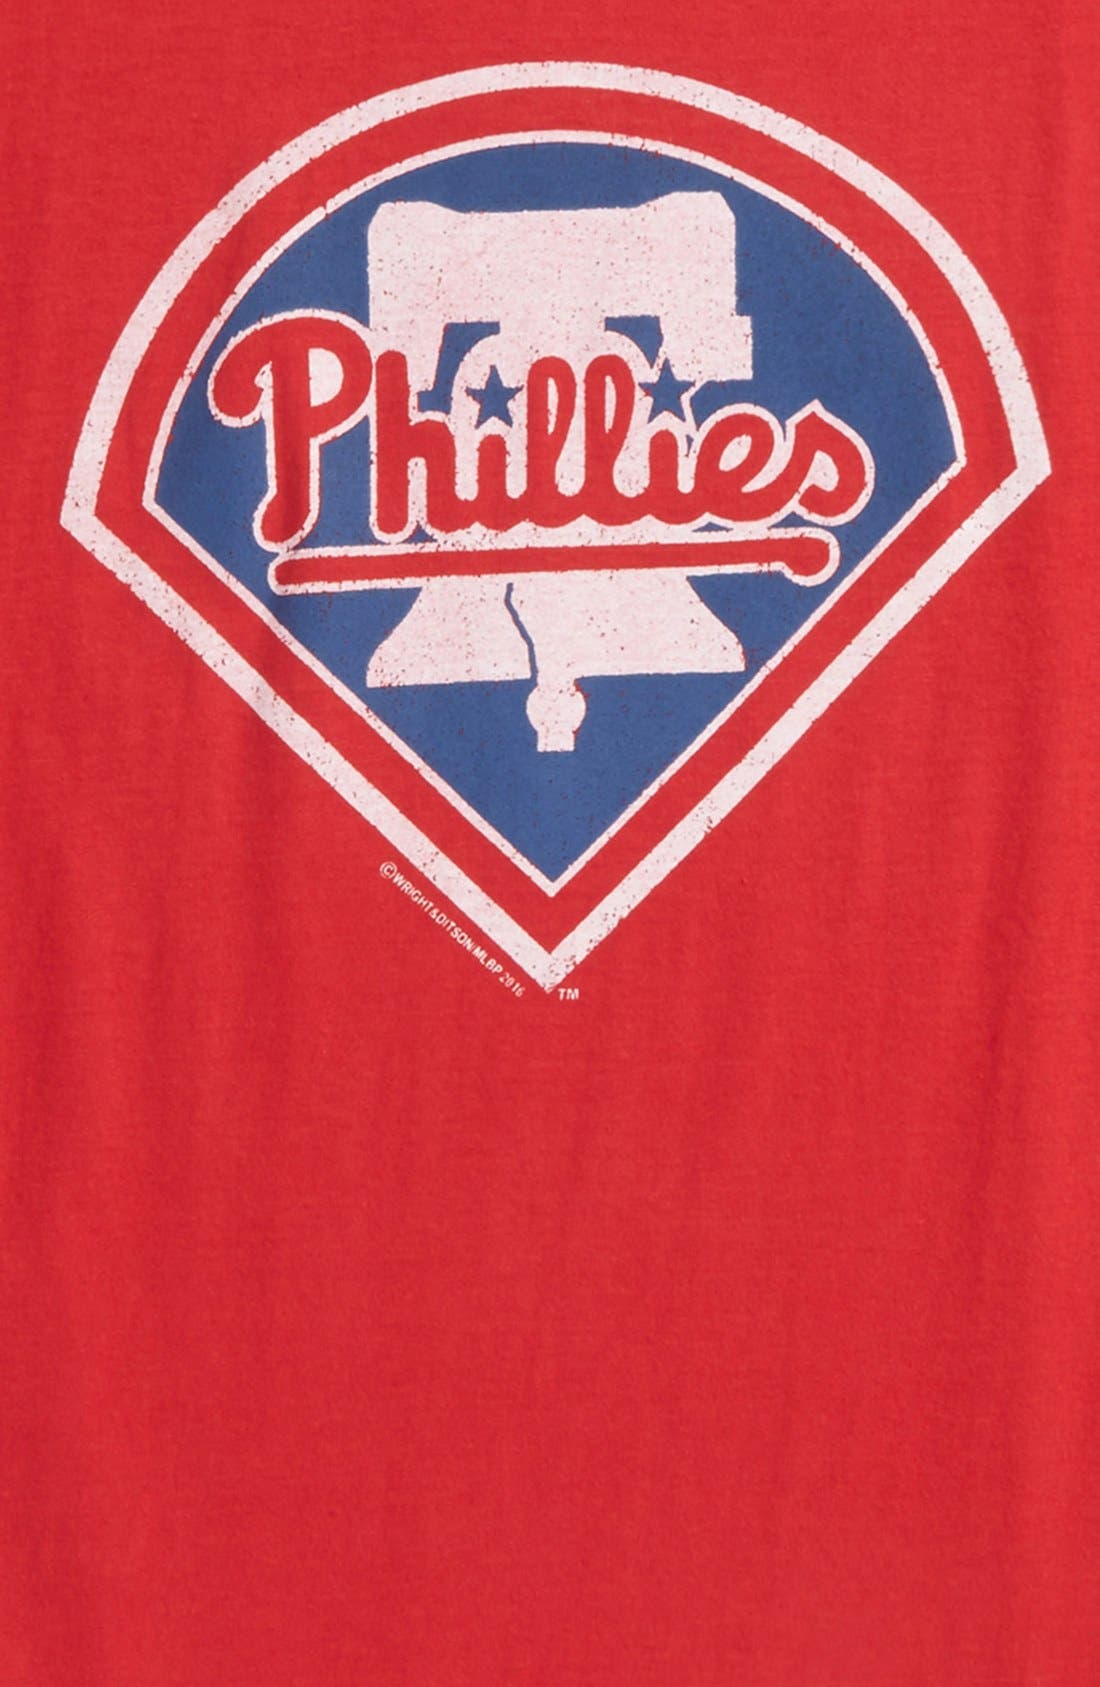 'Philadelphia Phillies' T-Shirt,                             Alternate thumbnail 2, color,                             600